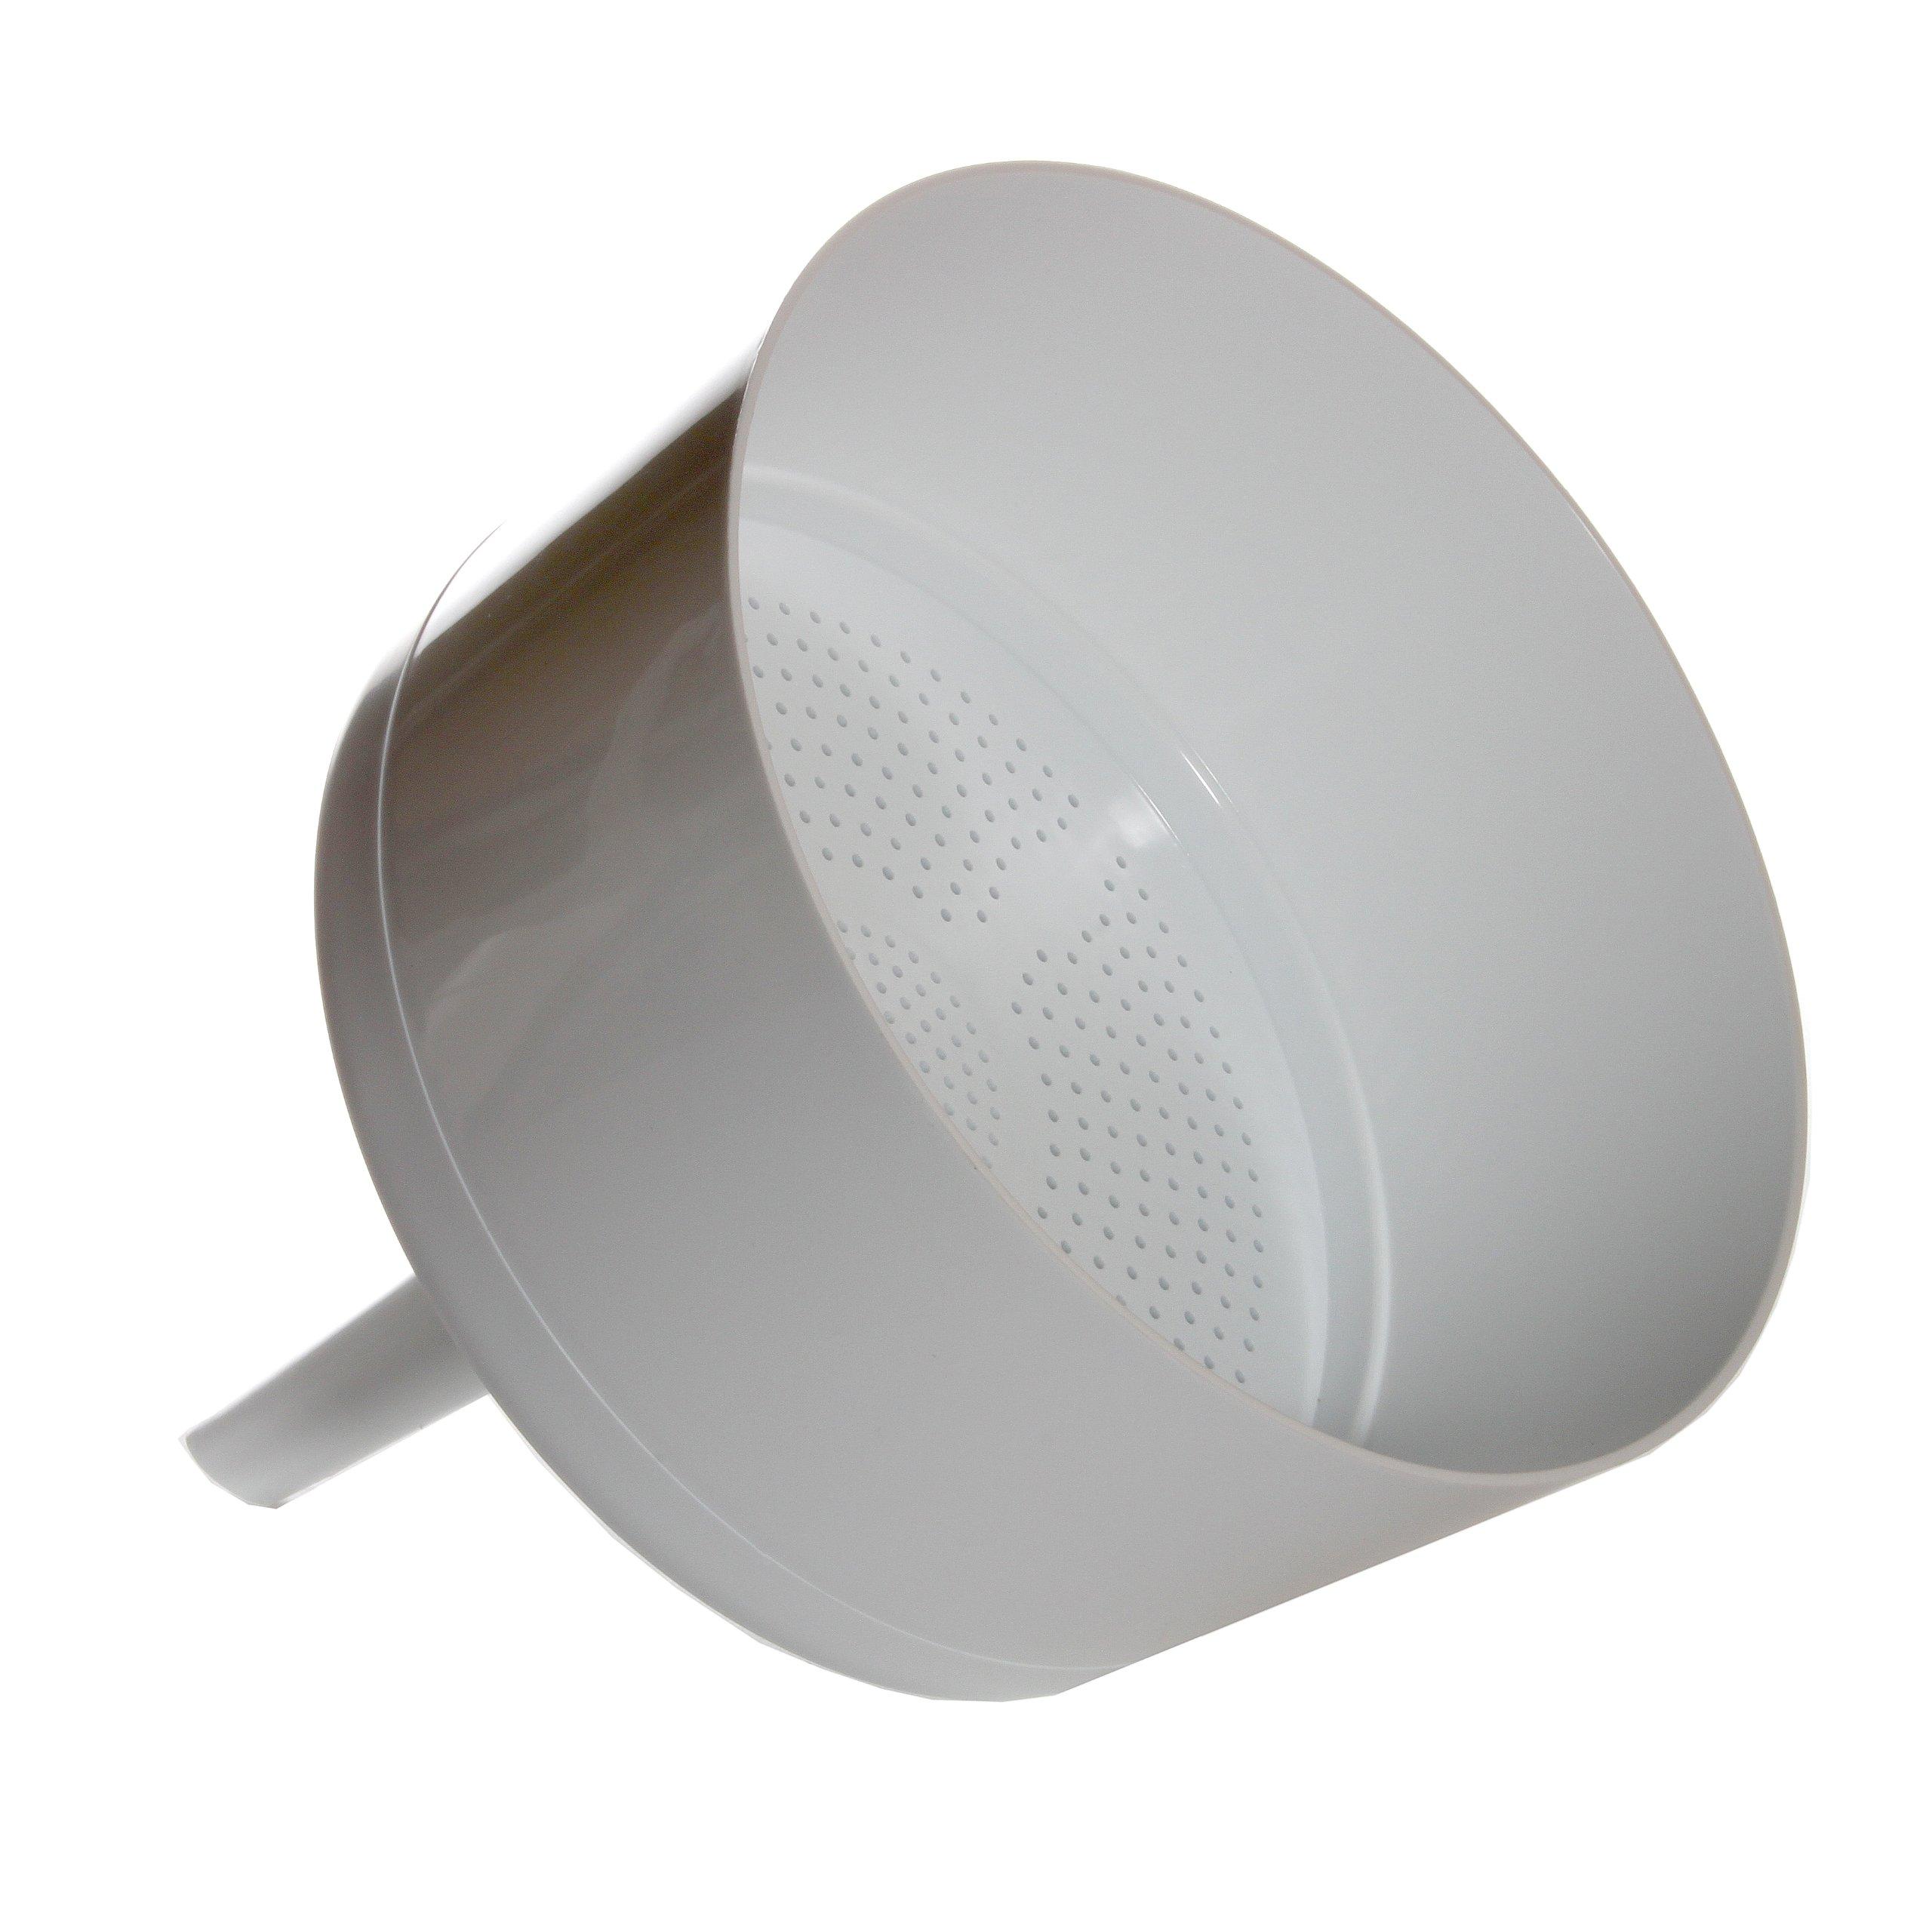 Kartell 242835-240 Polypropylene Autoclavable Buchner Funnel, 240mm Size